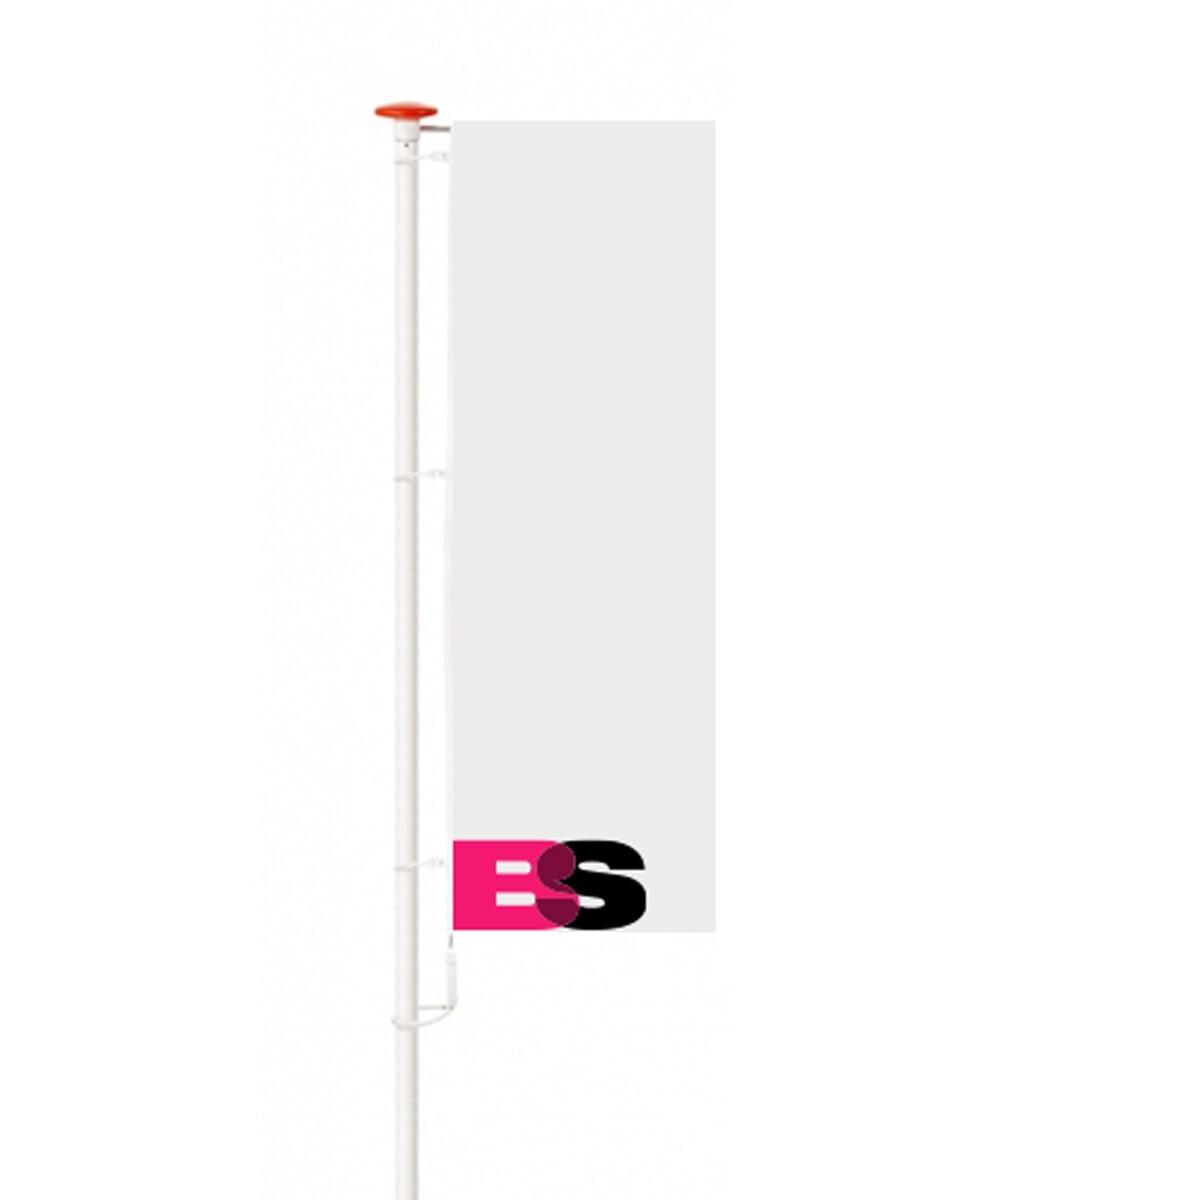 Vlaggenmast polyester Vlaggenmast polyester 8 M